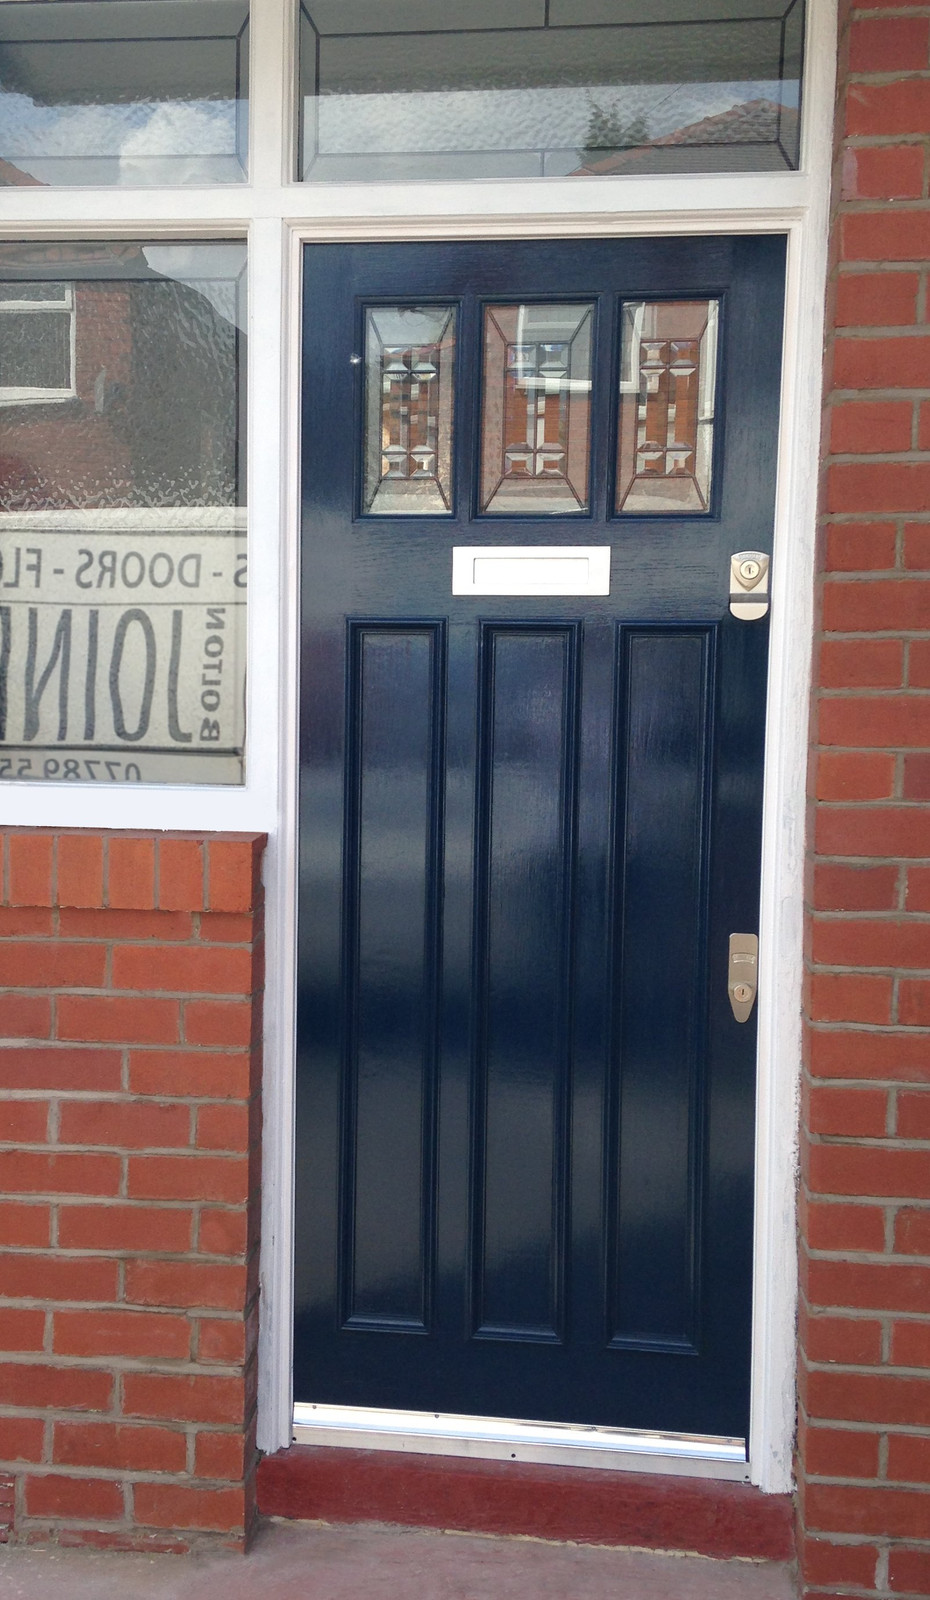 Grand 30 39 s 1930 39 s style wooden front doors you 39 ll love for 1930 front door